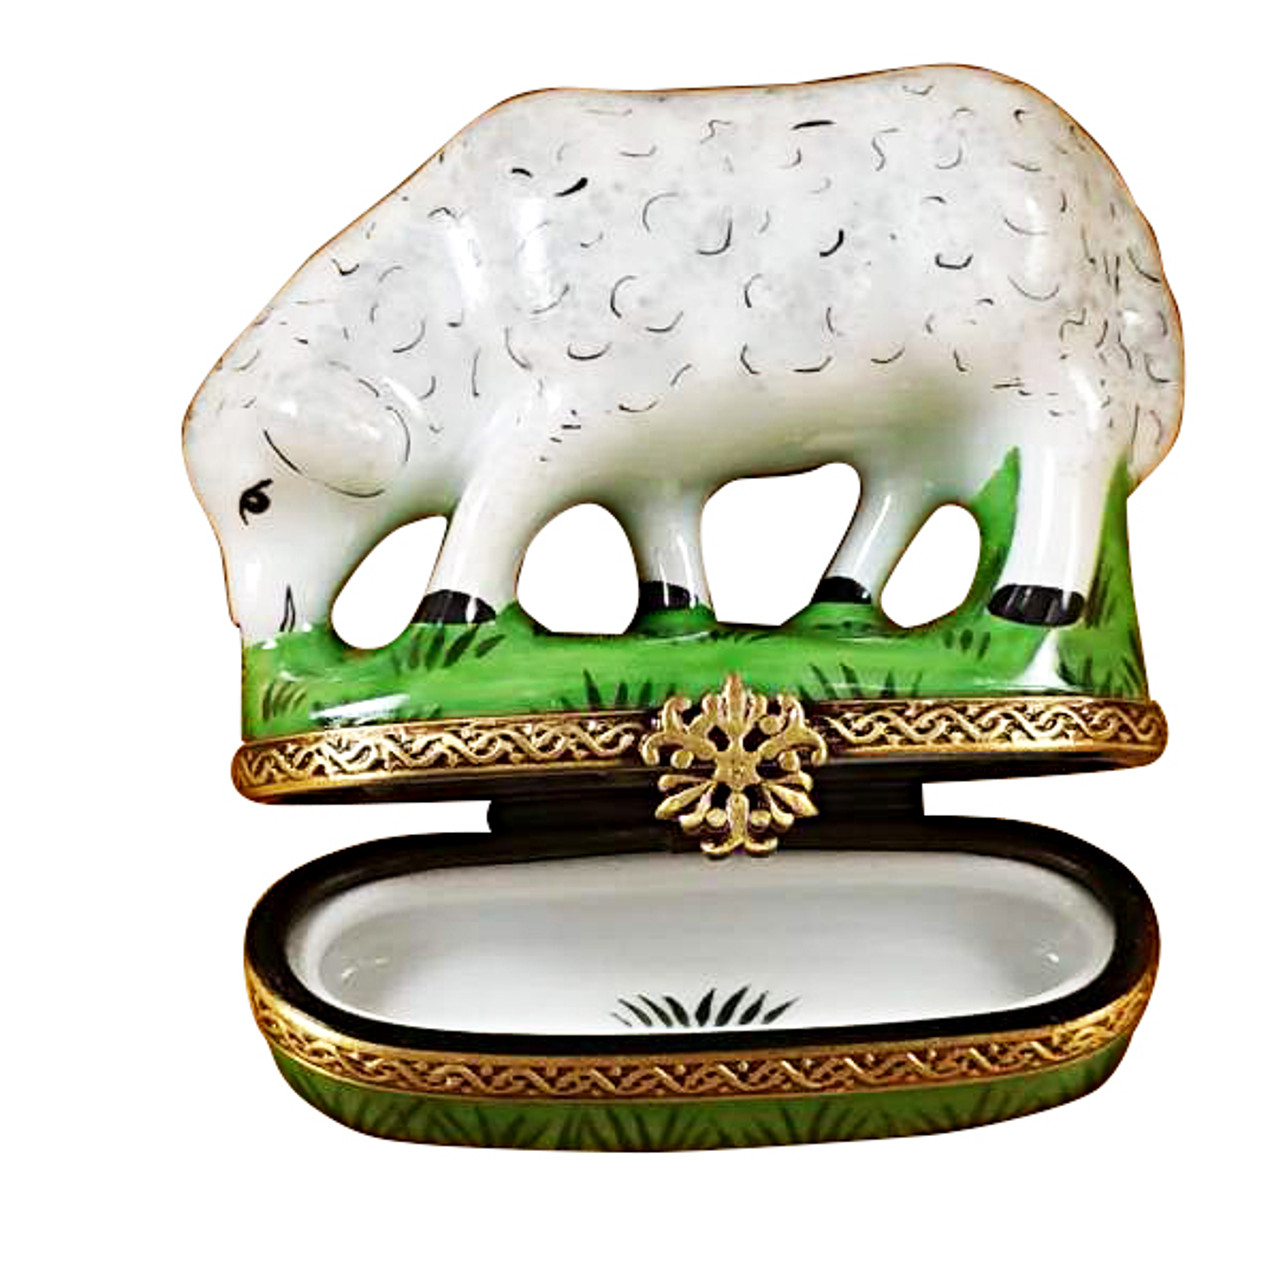 Sheep Rochard Limoges Box